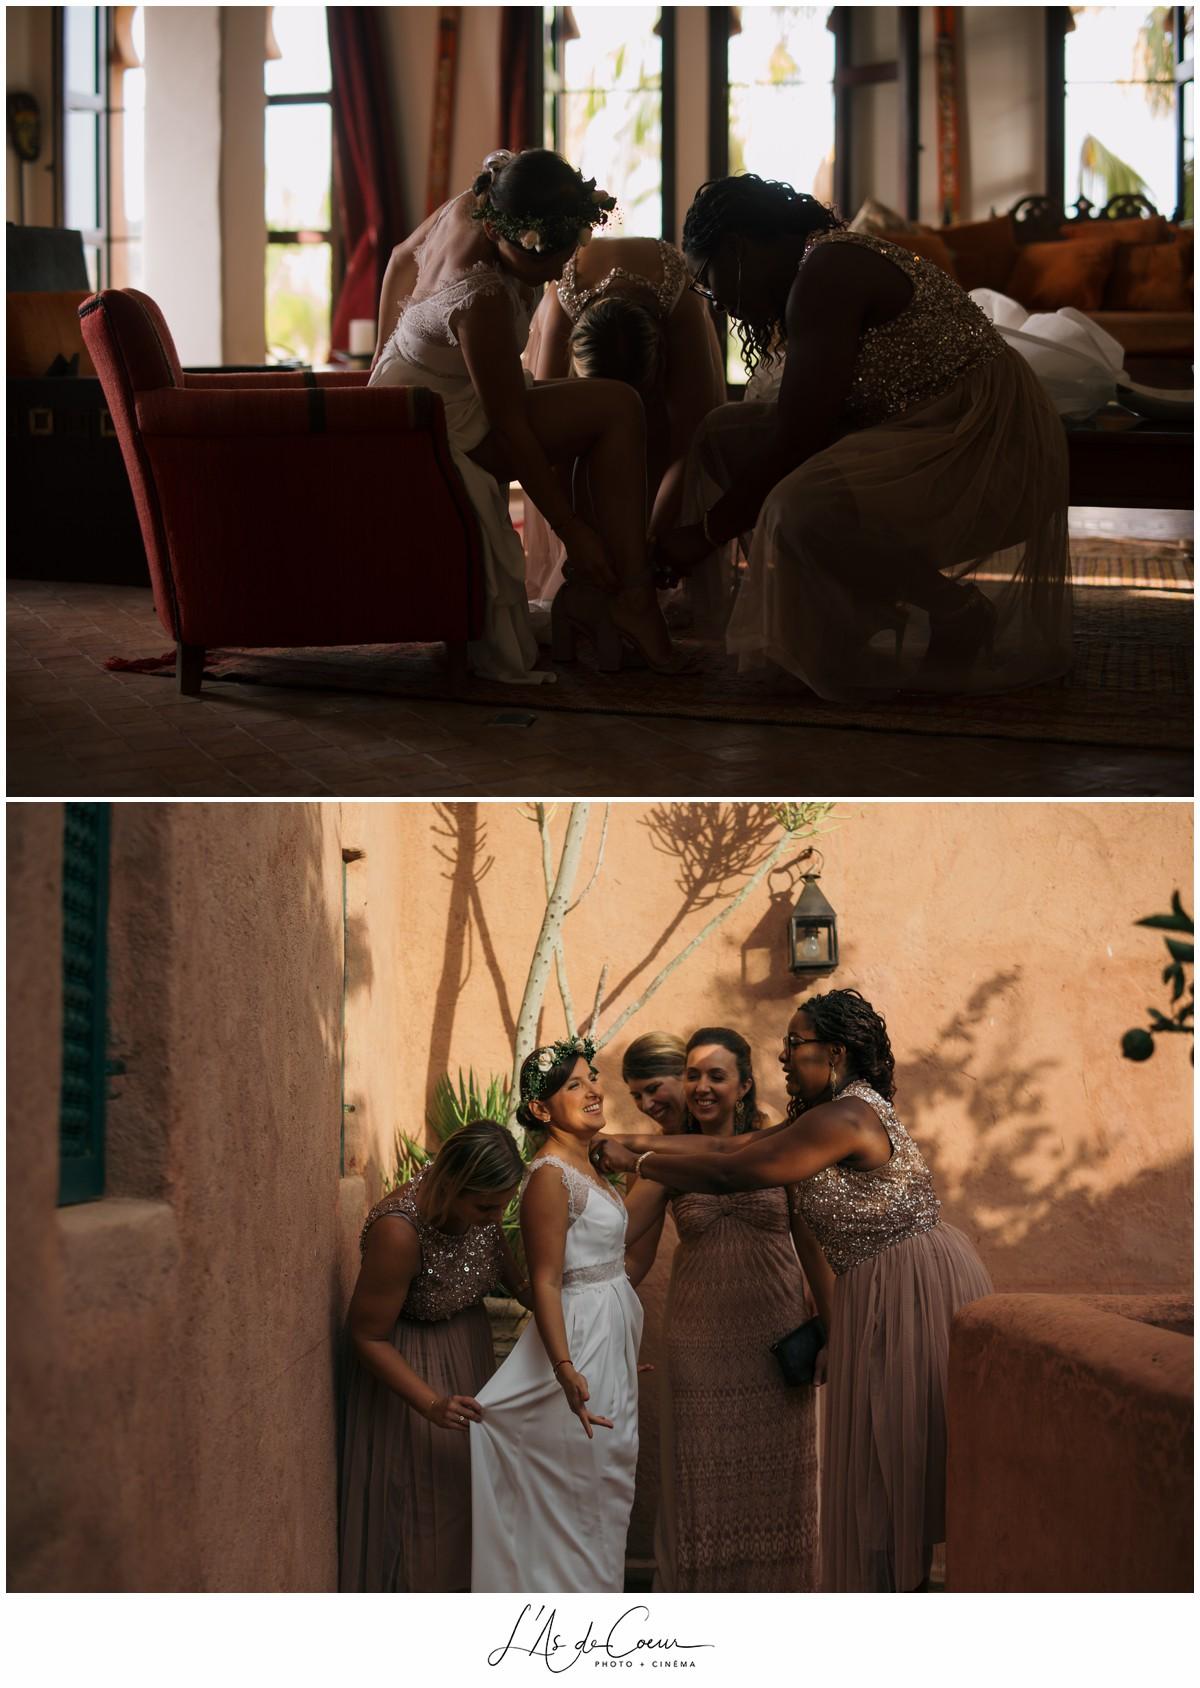 Preparatifs Photographe Mariage Essaouira le Jardin des Douars Maroc ©lasdecoeurphoto